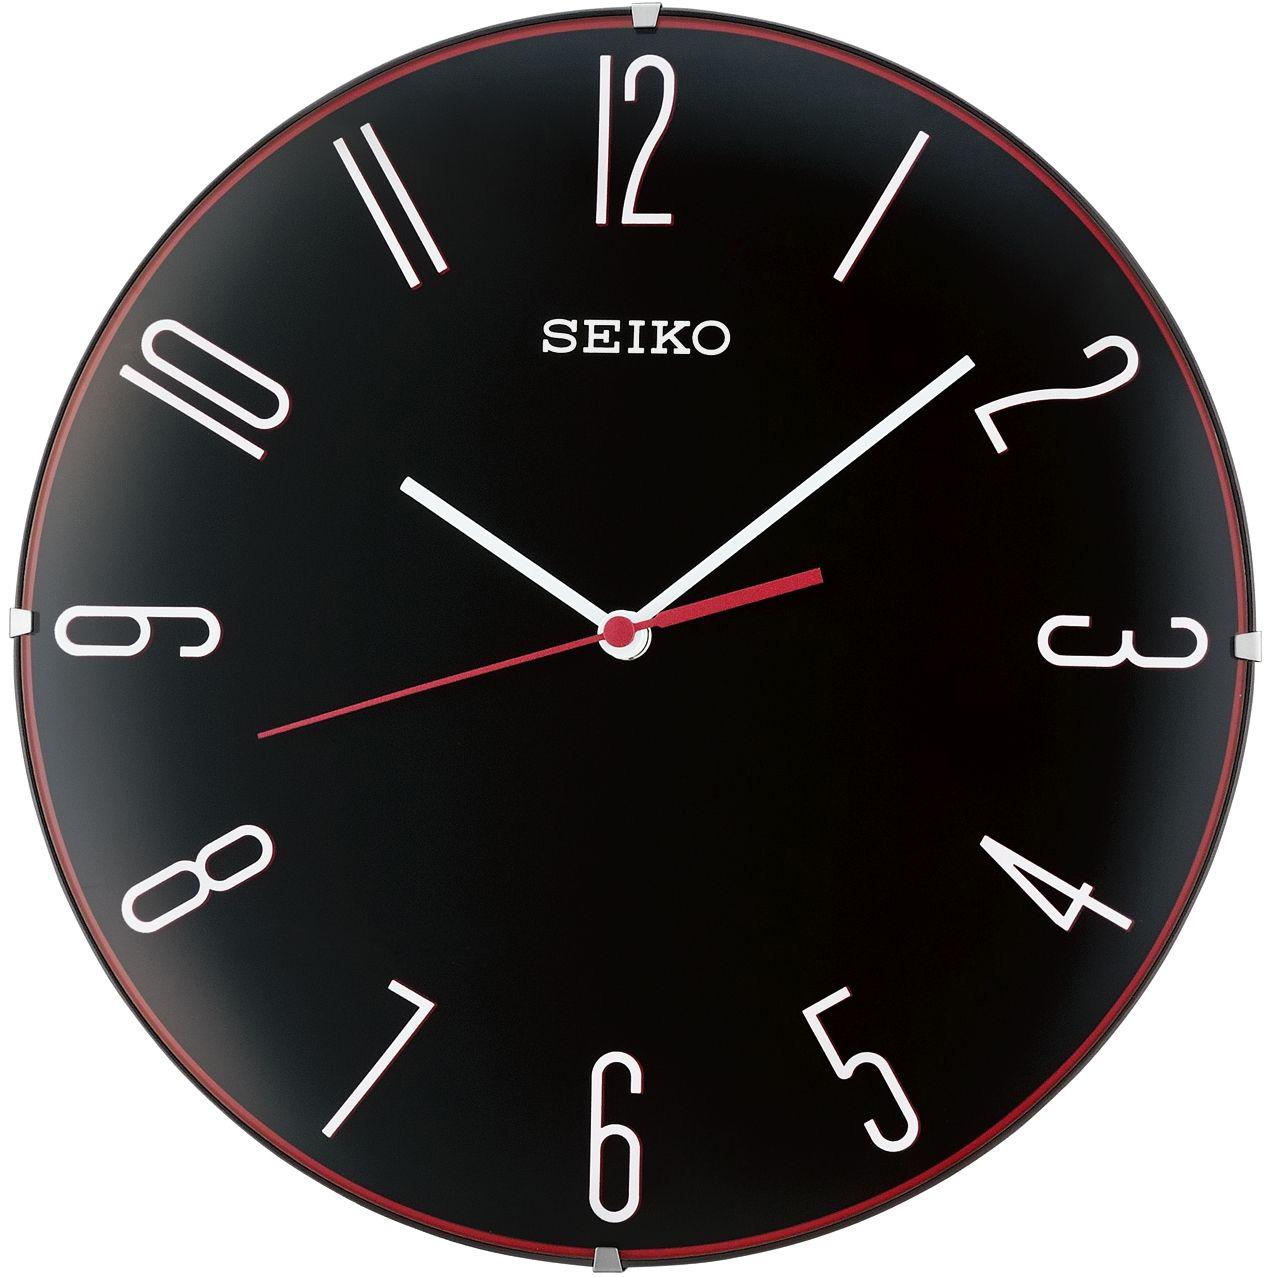 Seiko Wall Clock Qxa672k Swing Watch Indonesia